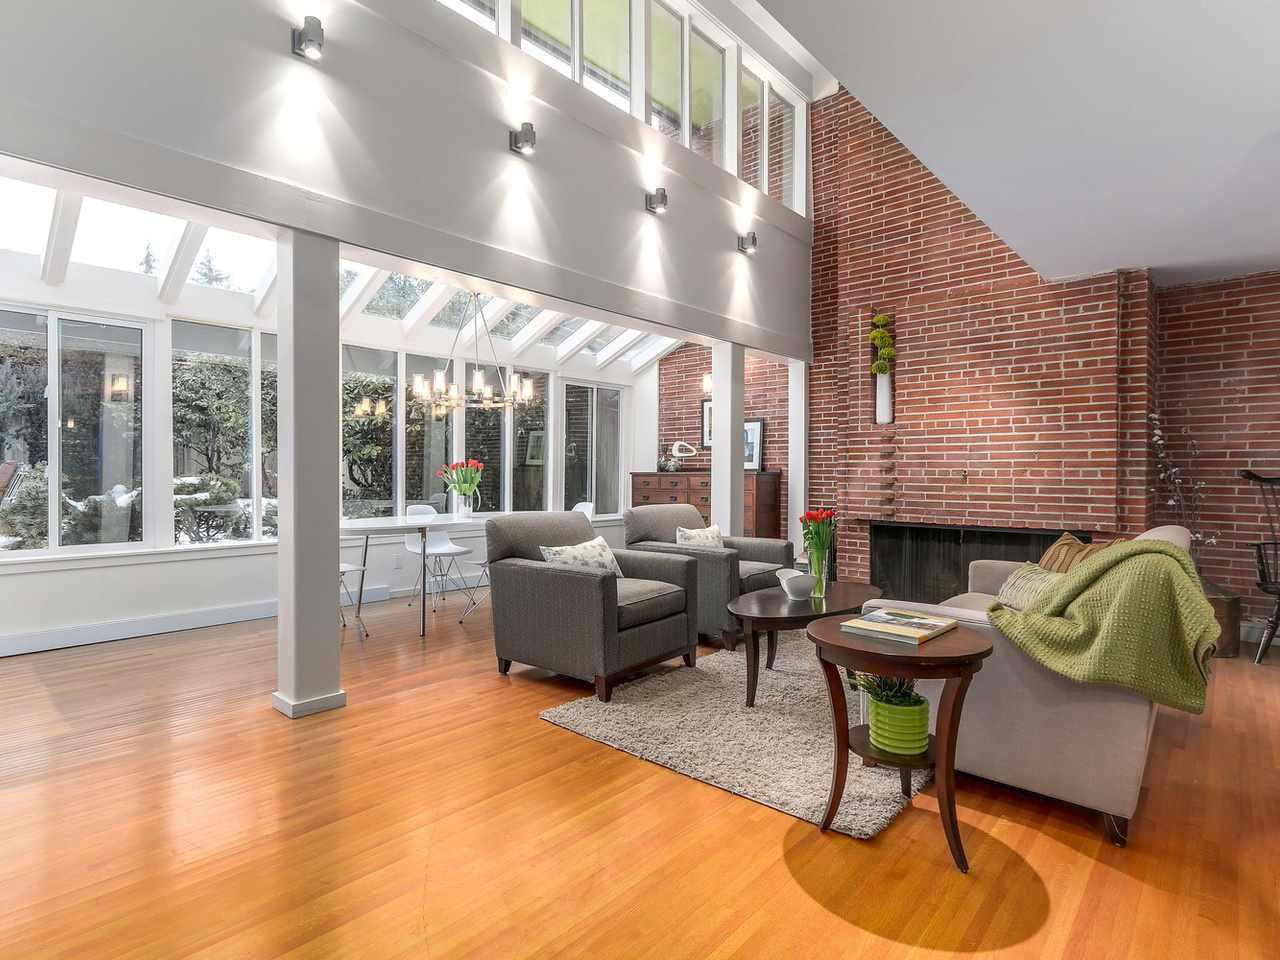 Photo 3: Photos: 3708 EDGEMONT Boulevard in North Vancouver: Edgemont House Fourplex for sale : MLS®# R2138514